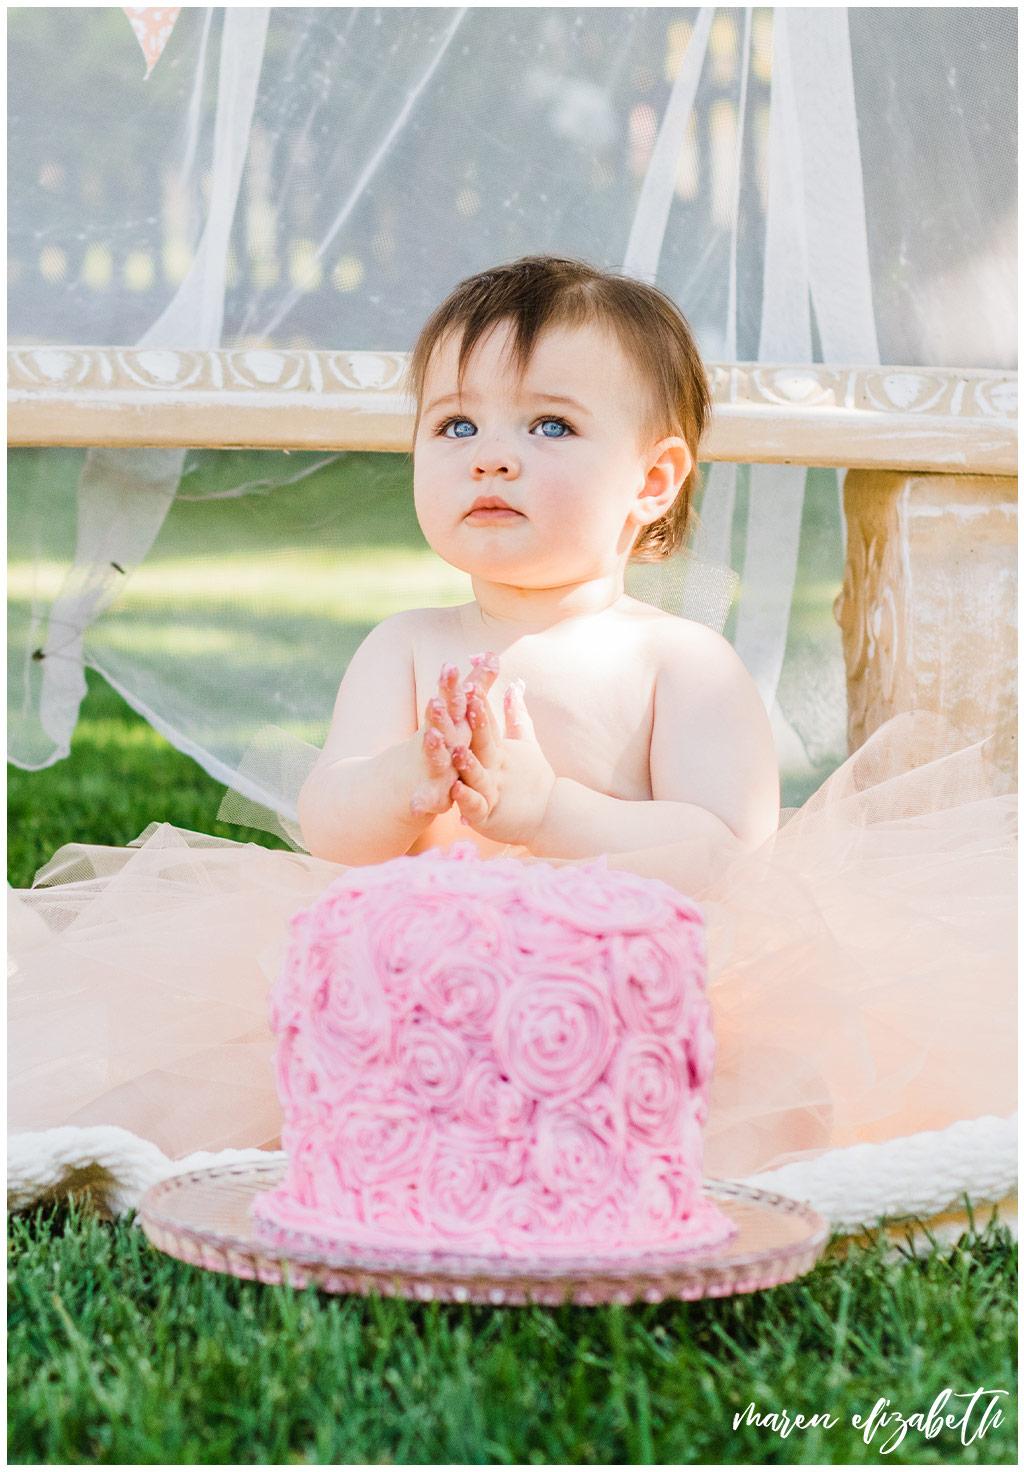 DIY Little Girl Cake Smash | Emi's one year old cake smash had a cute little girl theme. We got the decorations on the facebook marketplace and I made the cake myself. | Arizona Family Photographer | Maren Elizabeth Photography